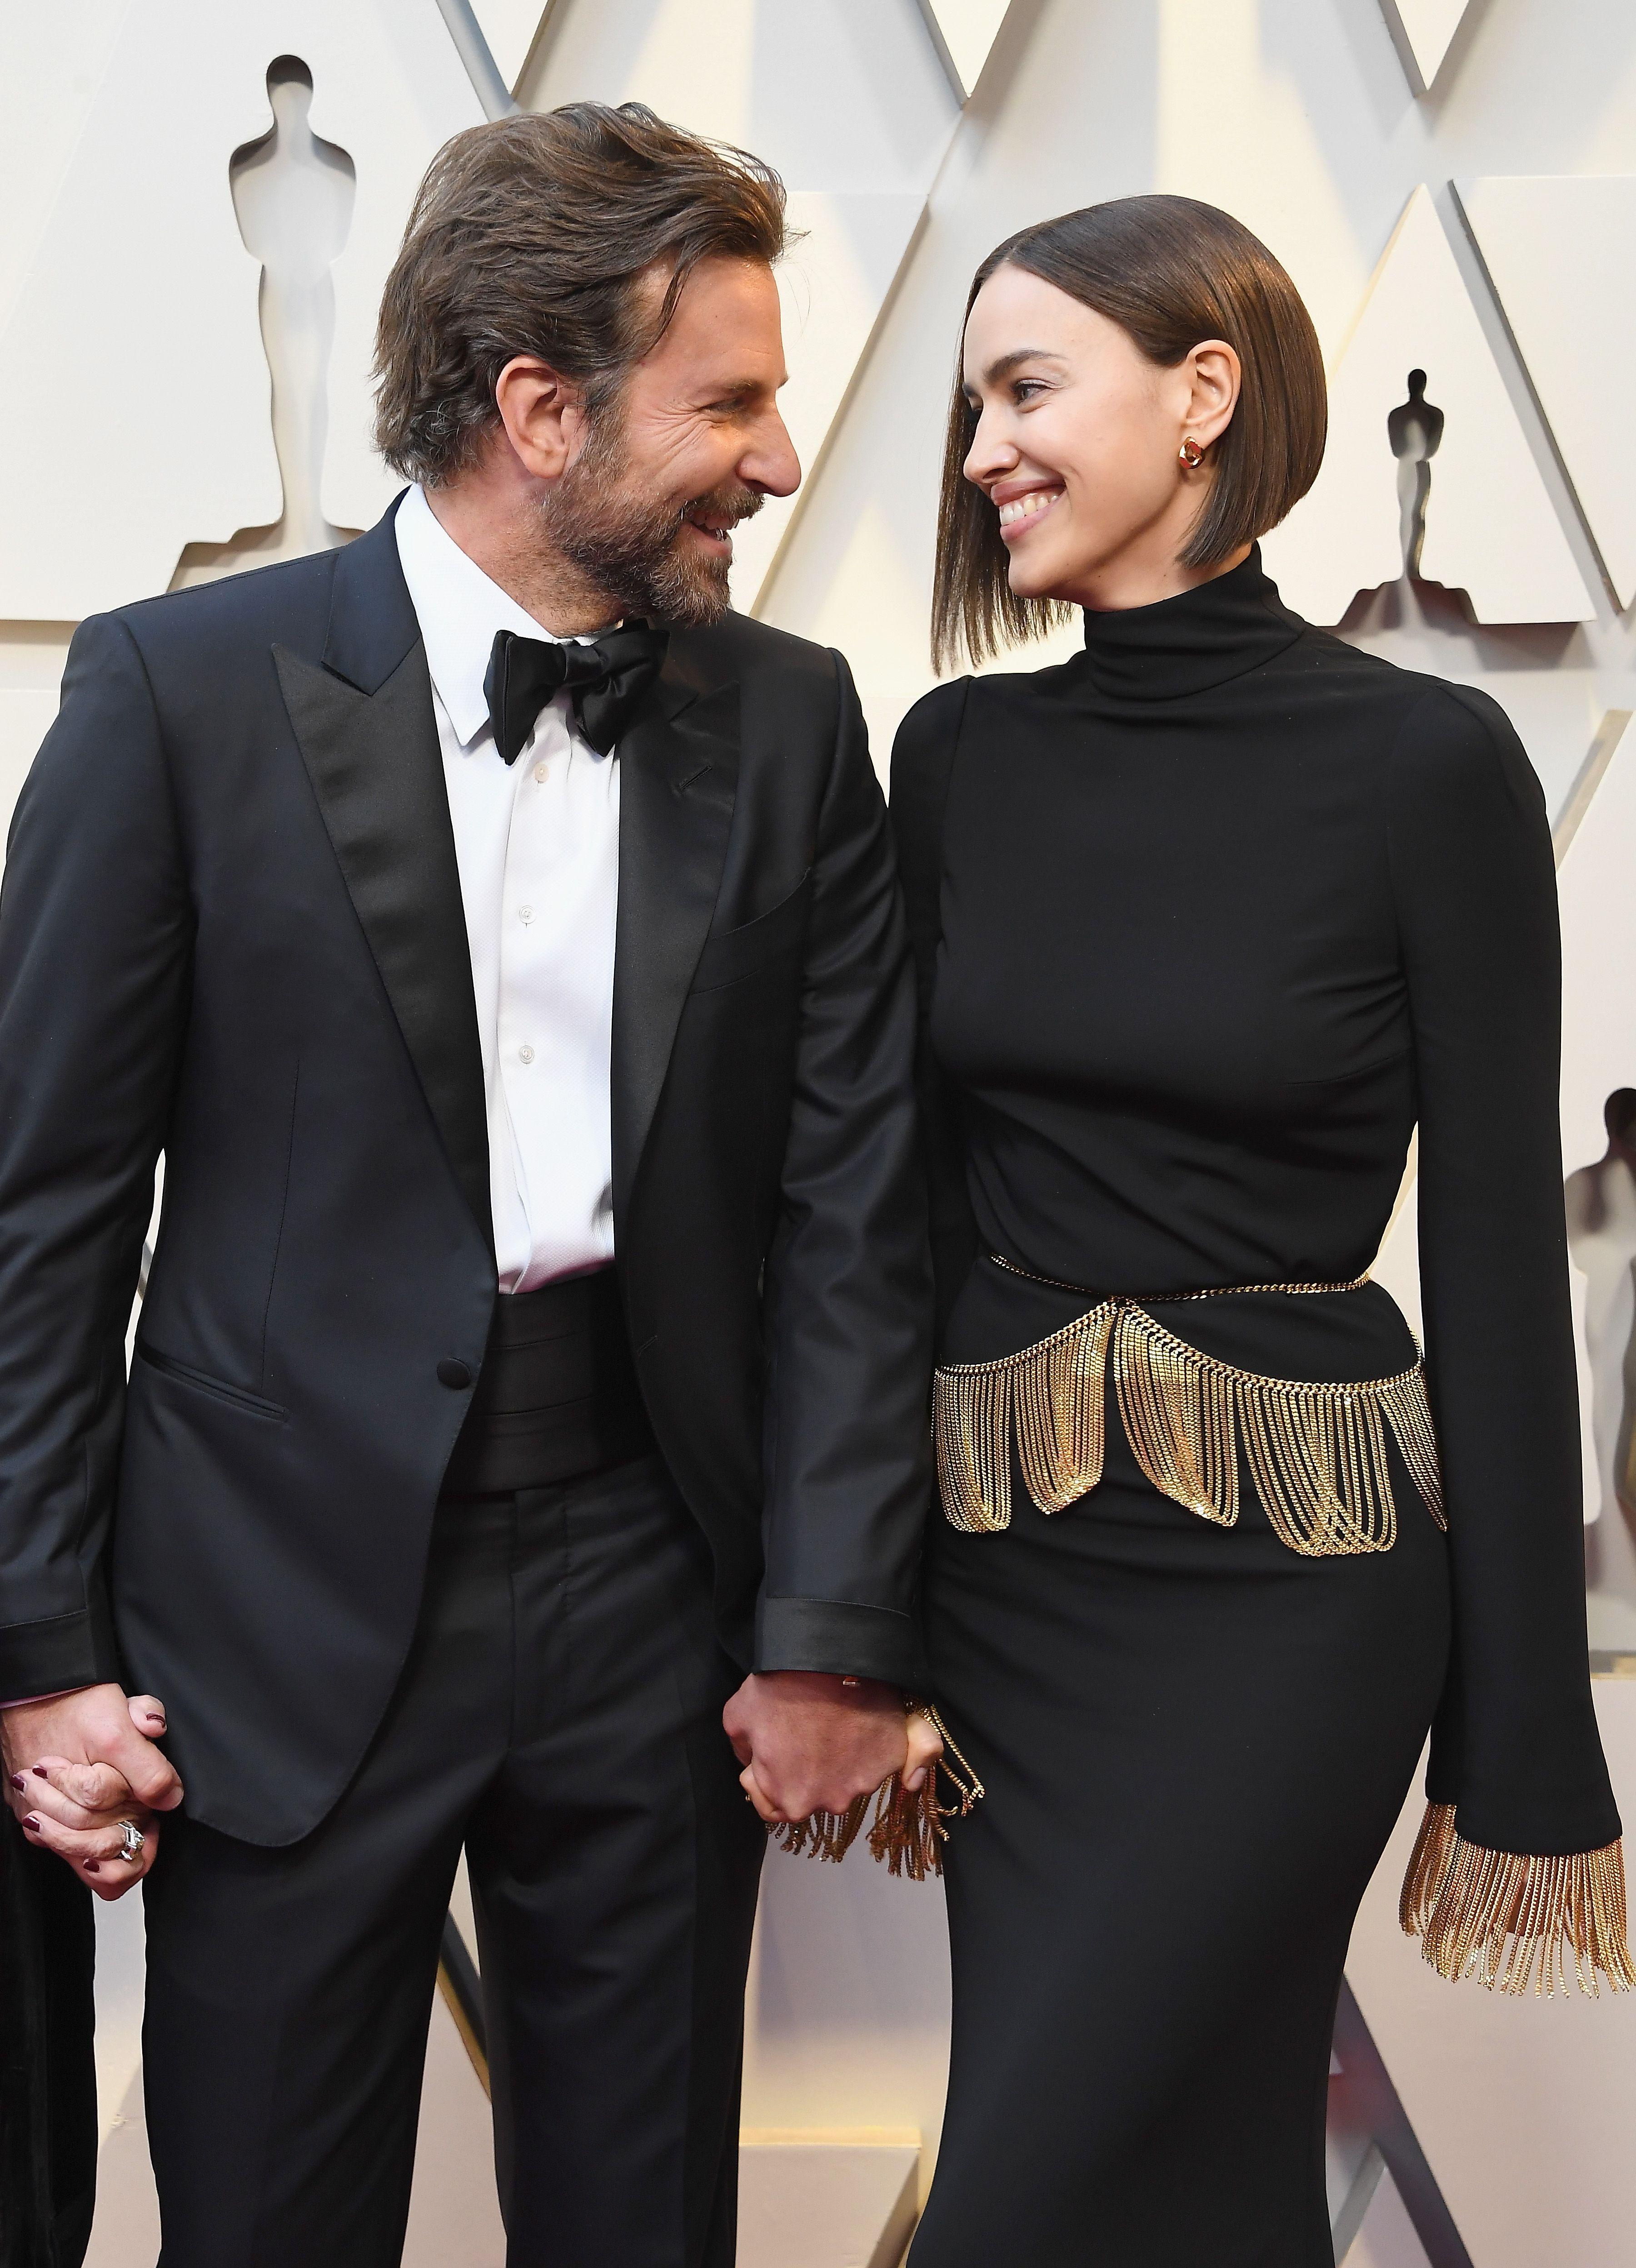 Bradley Cooper and ex Irina Shayk on the red carpet.